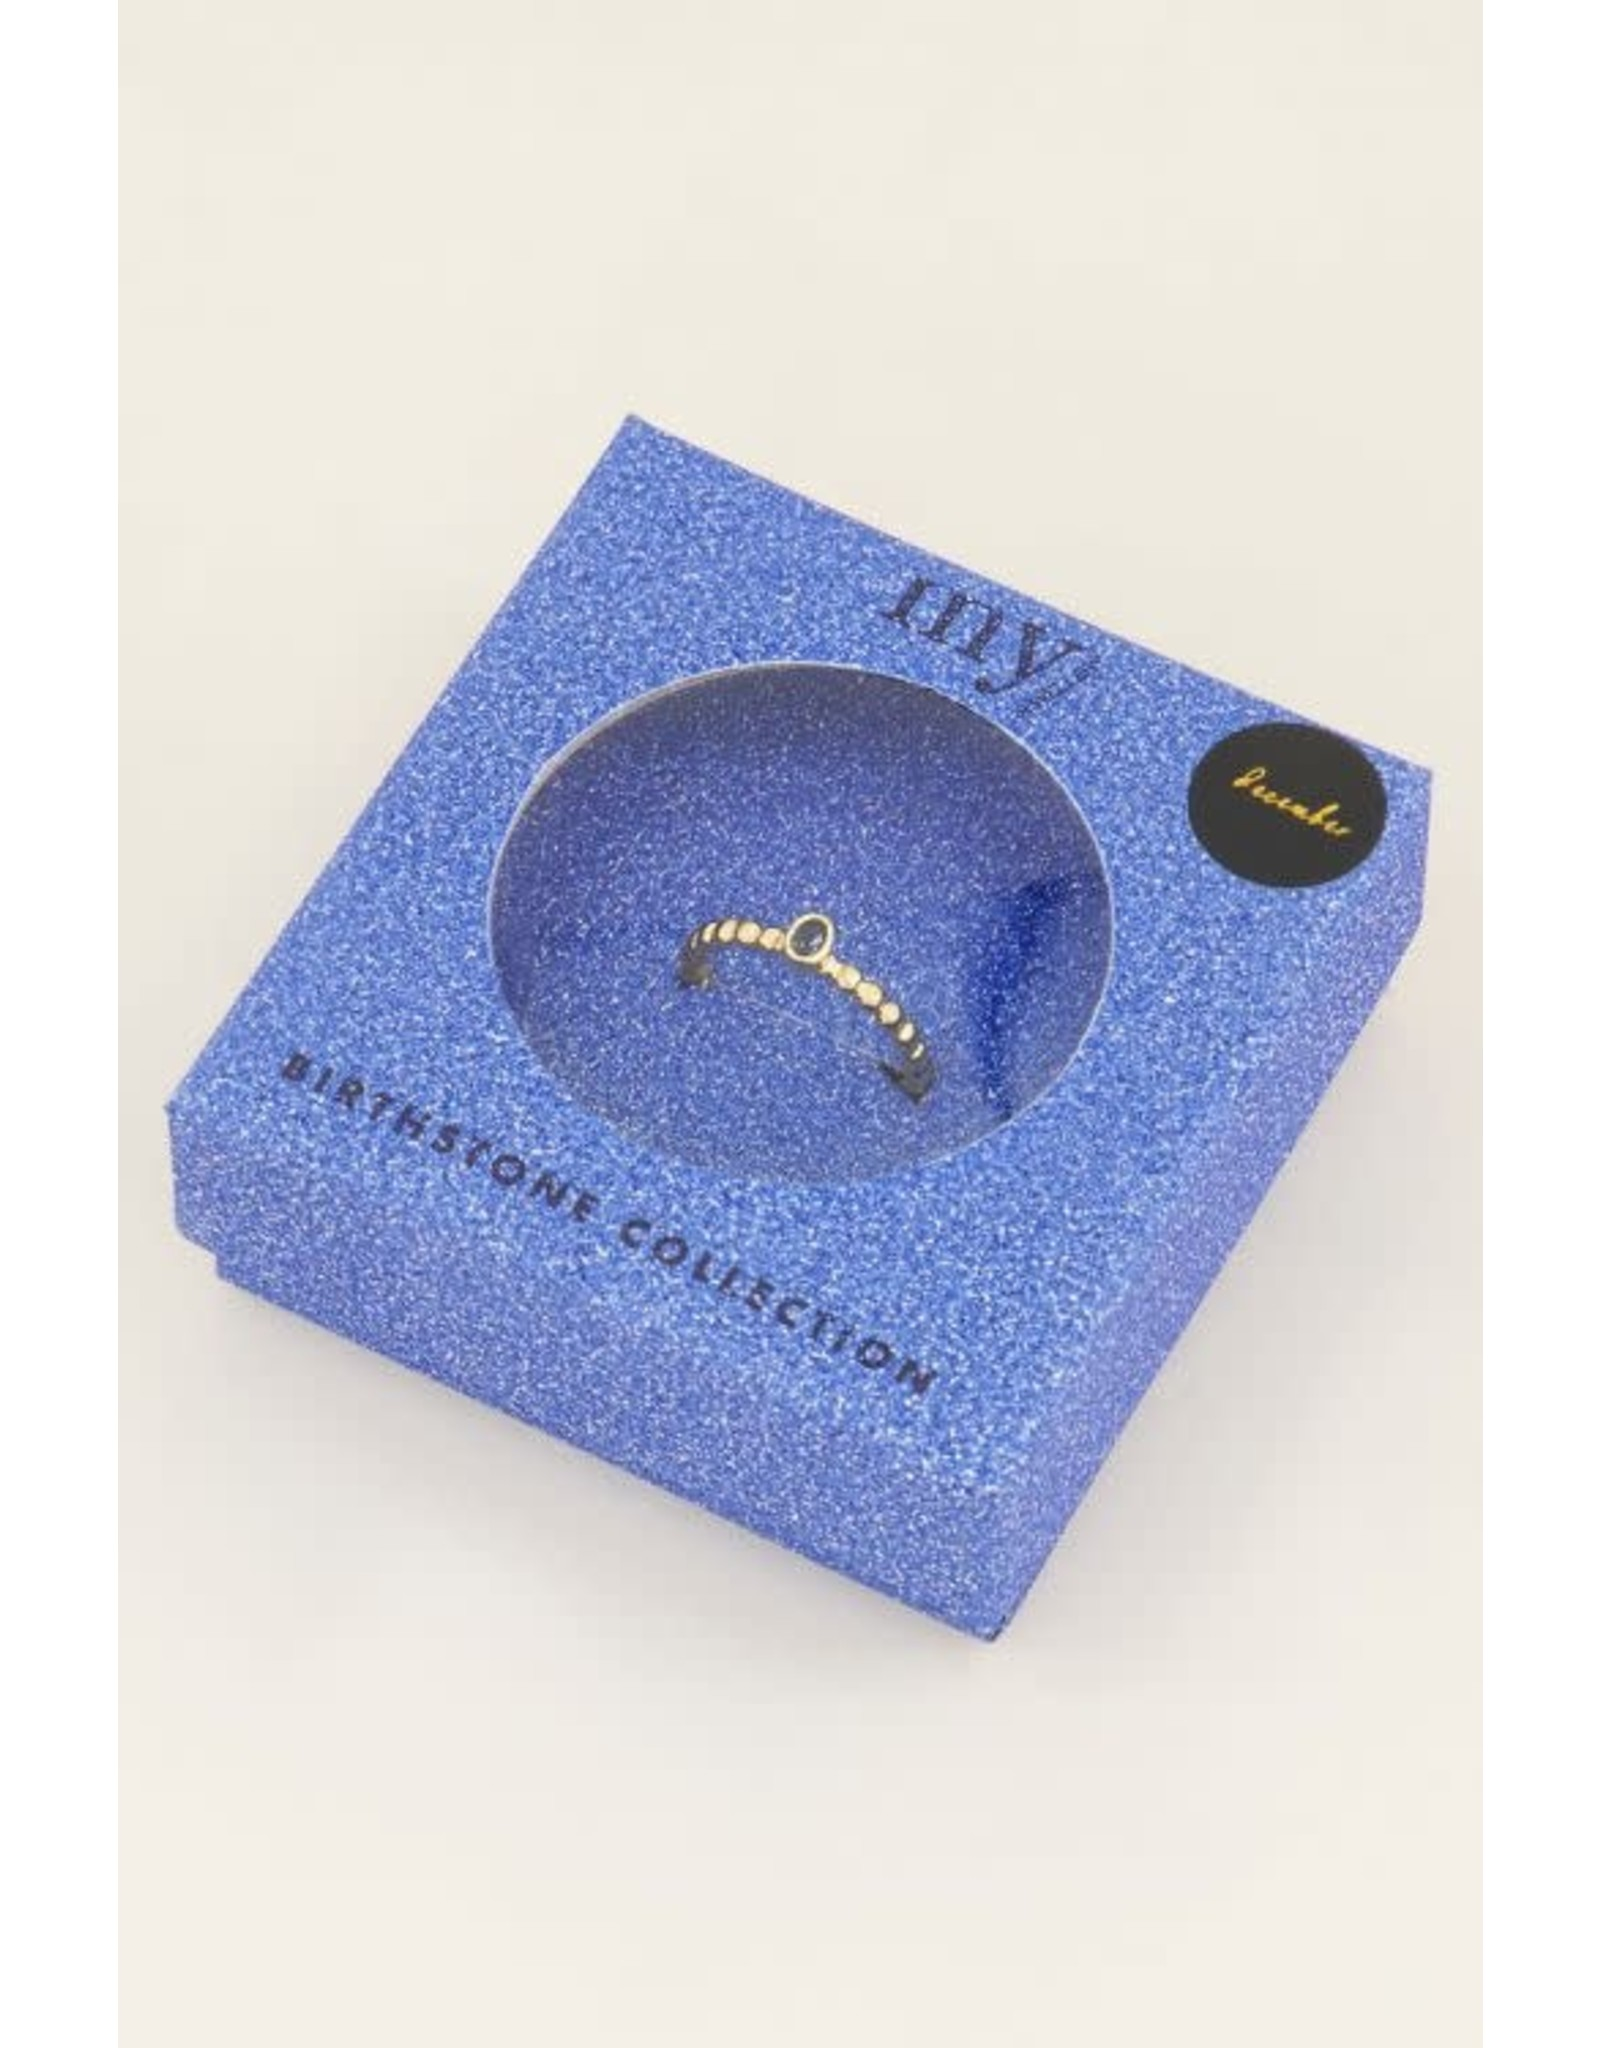 My Jewellery My Jewellery geboortesteen ring december